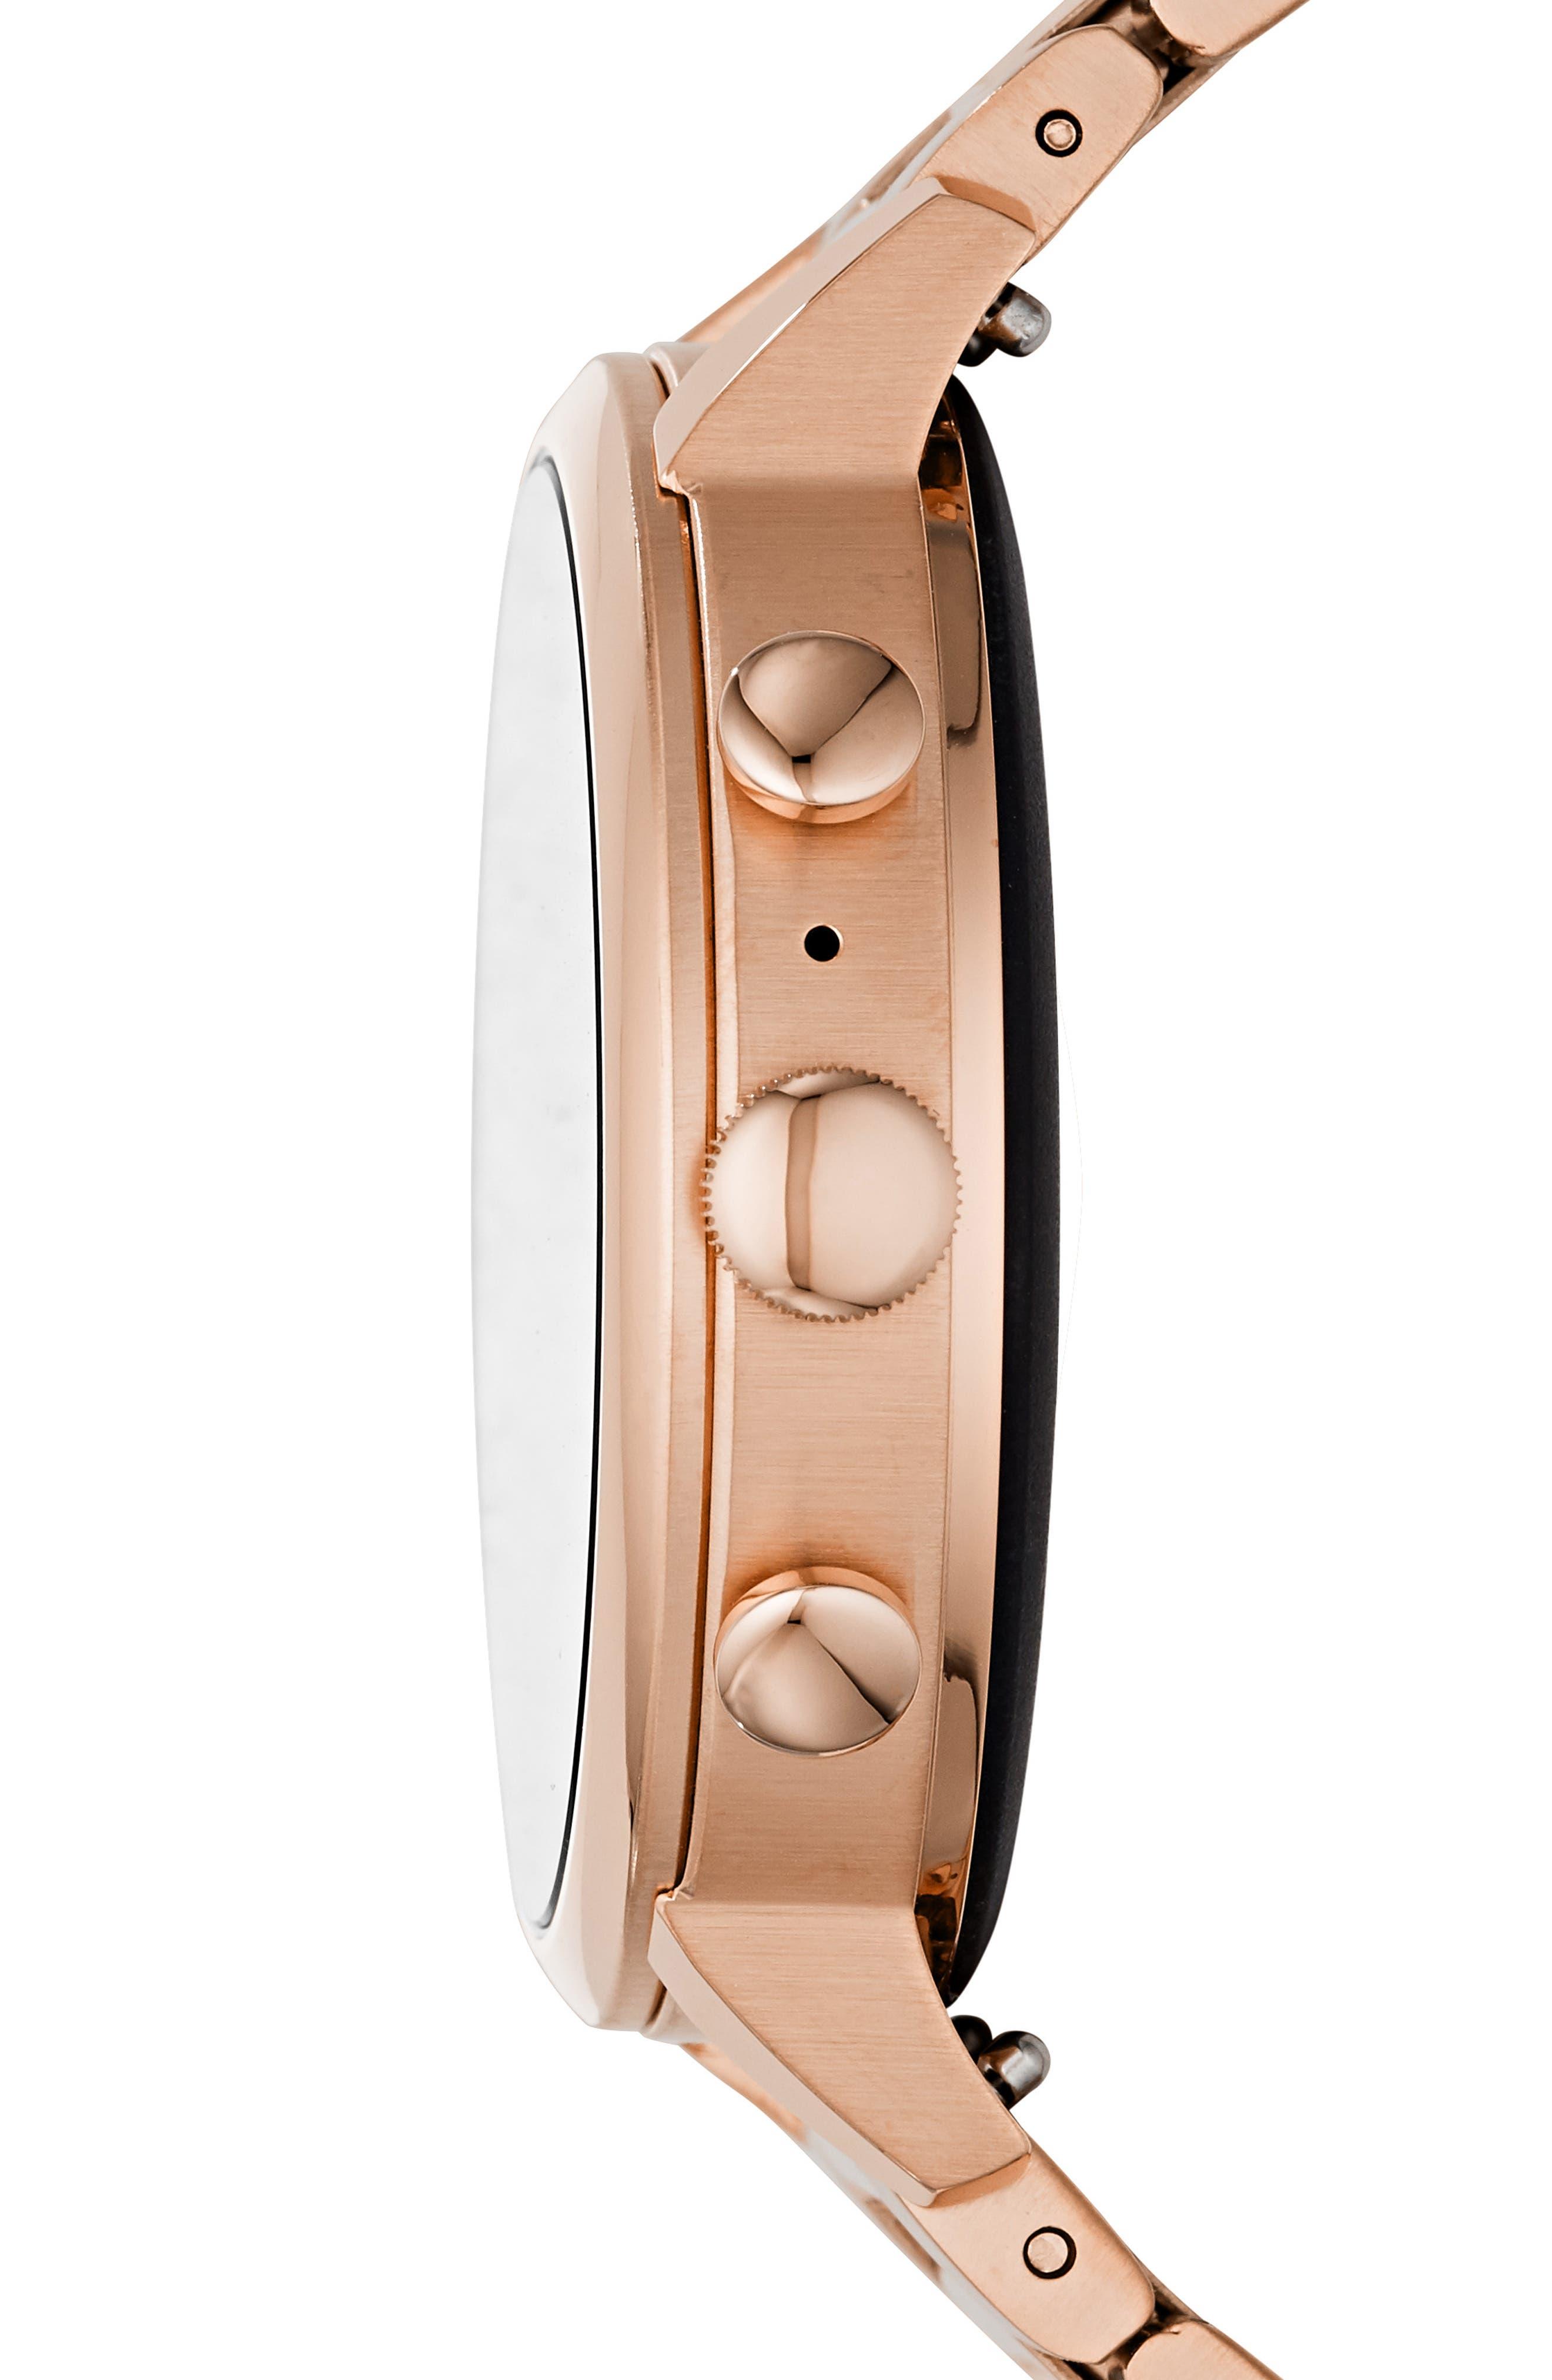 FOSSIL, Q Venture HR Bracelet Watch, 40mm, Alternate thumbnail 3, color, ROSE GOLD